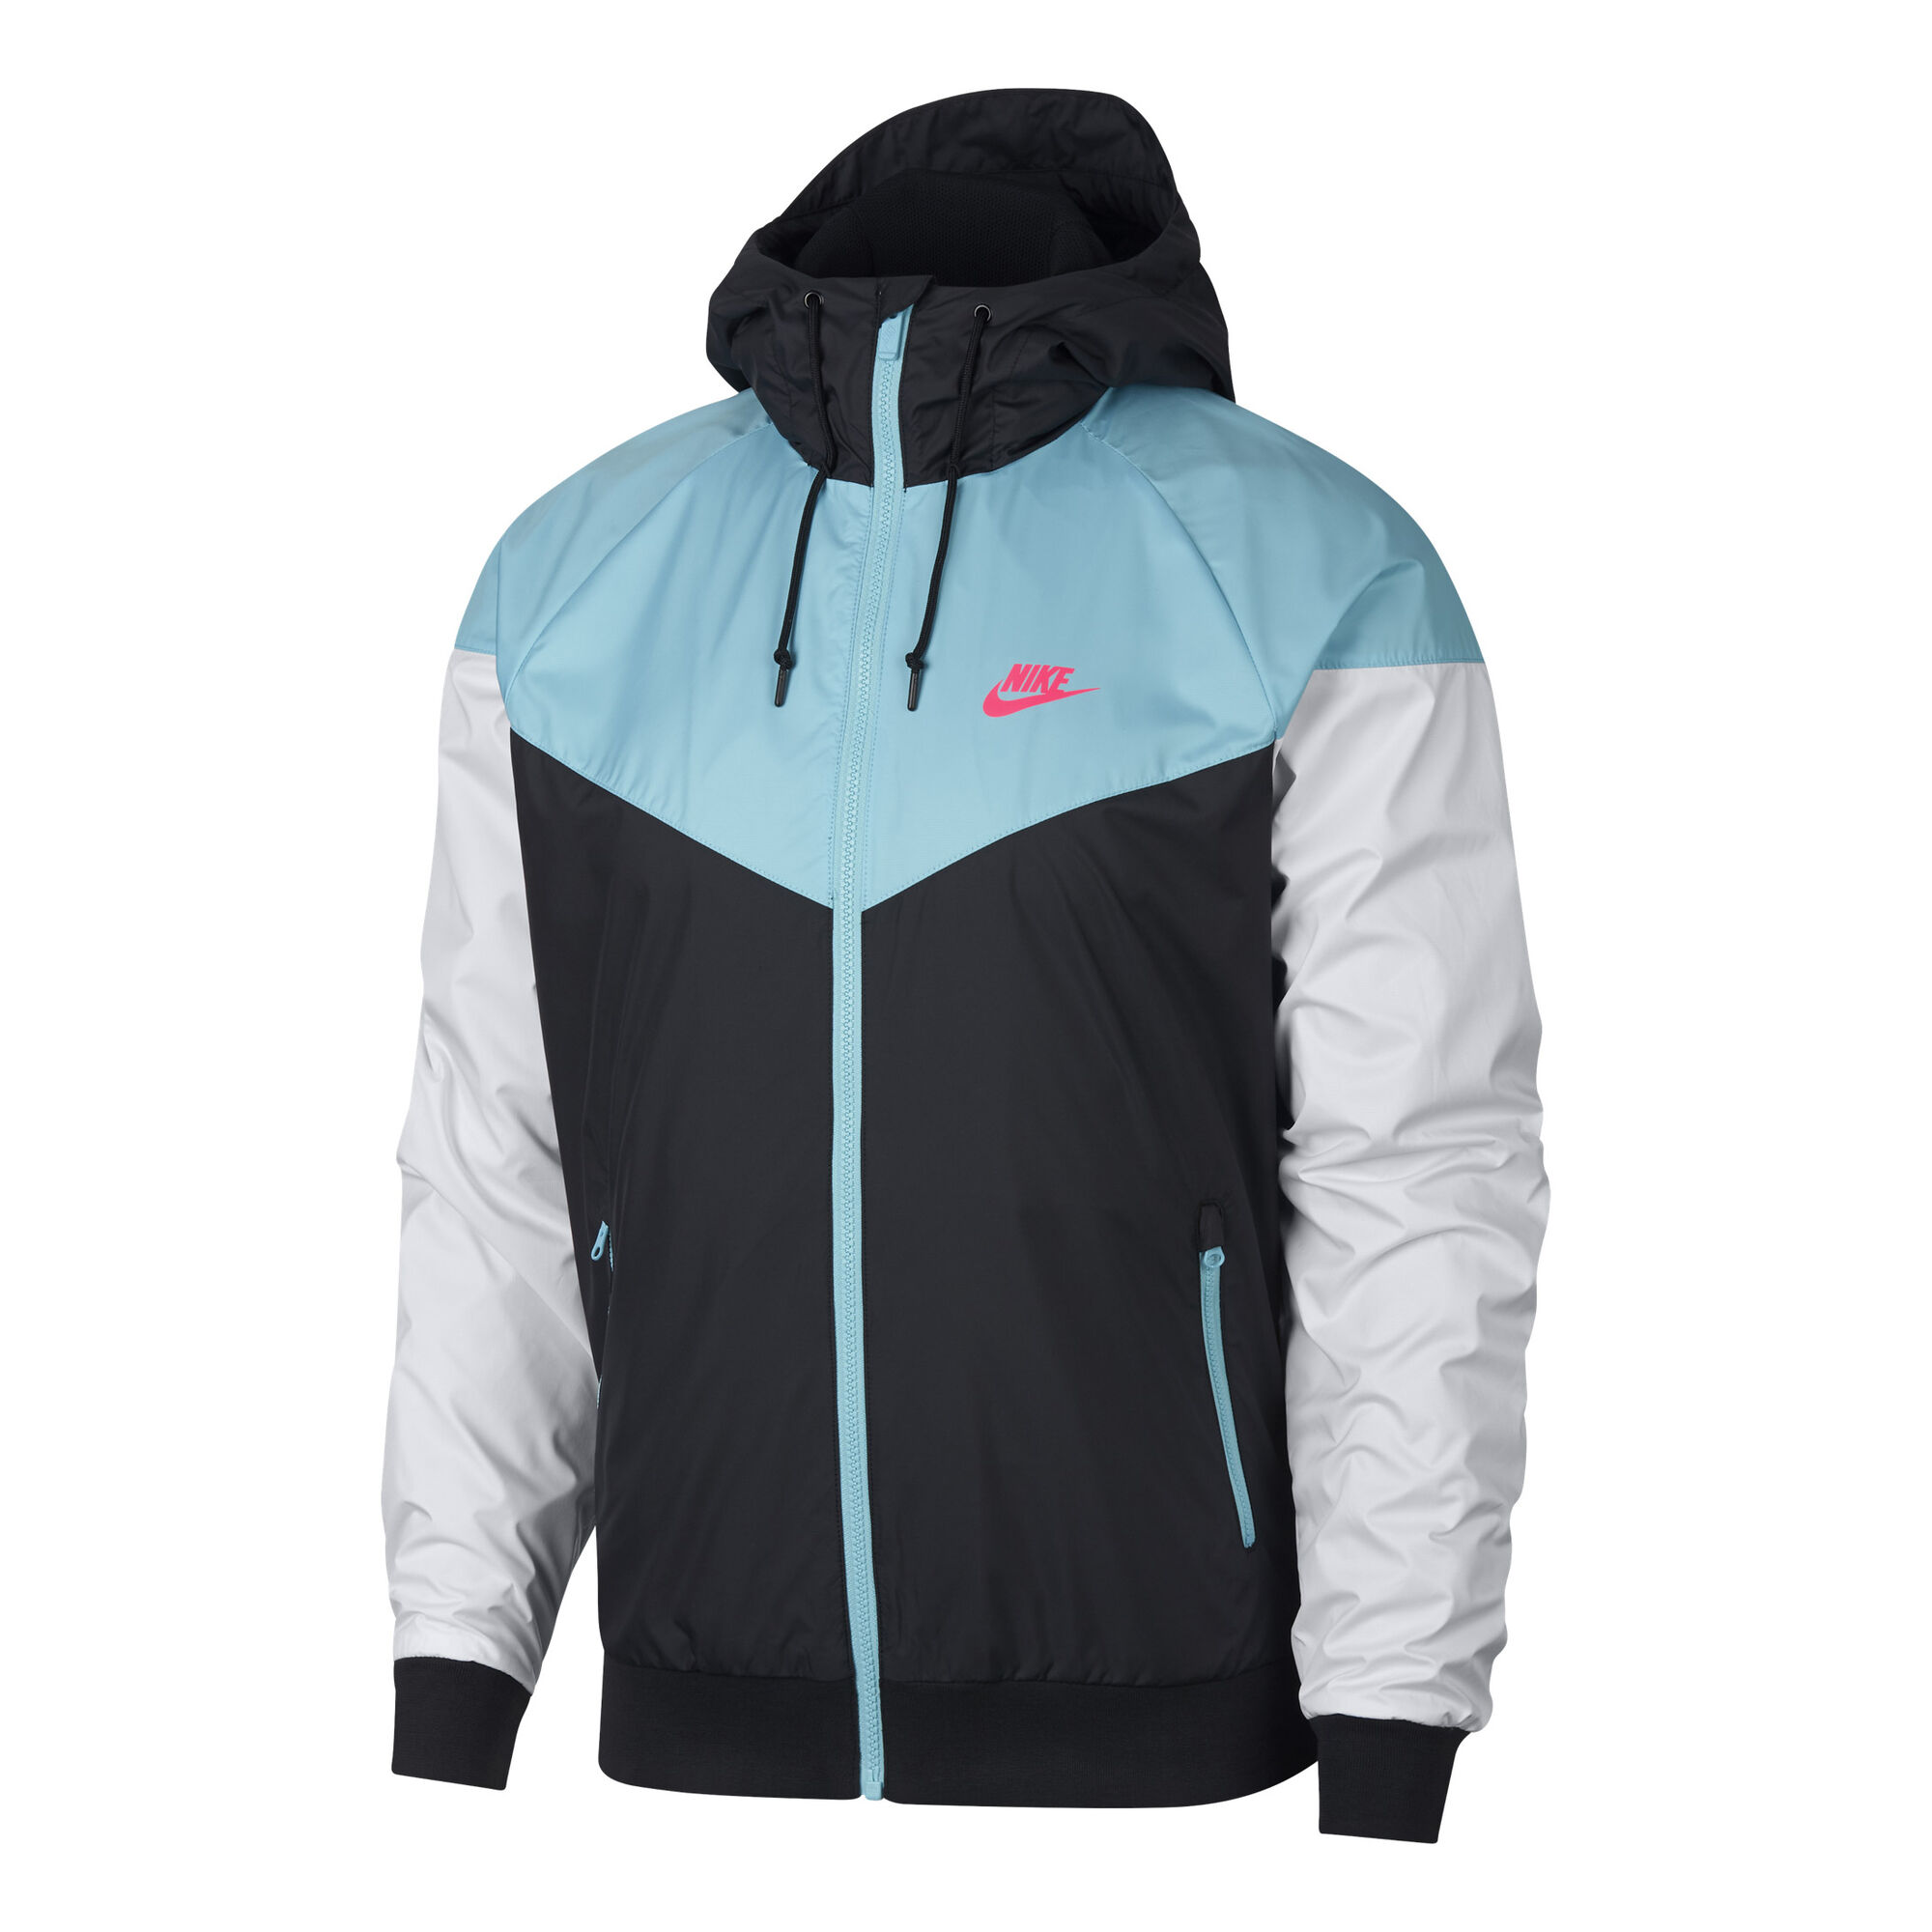 buy Nike Sportswear Windrunner Training Jacket Men - Black f441c4316